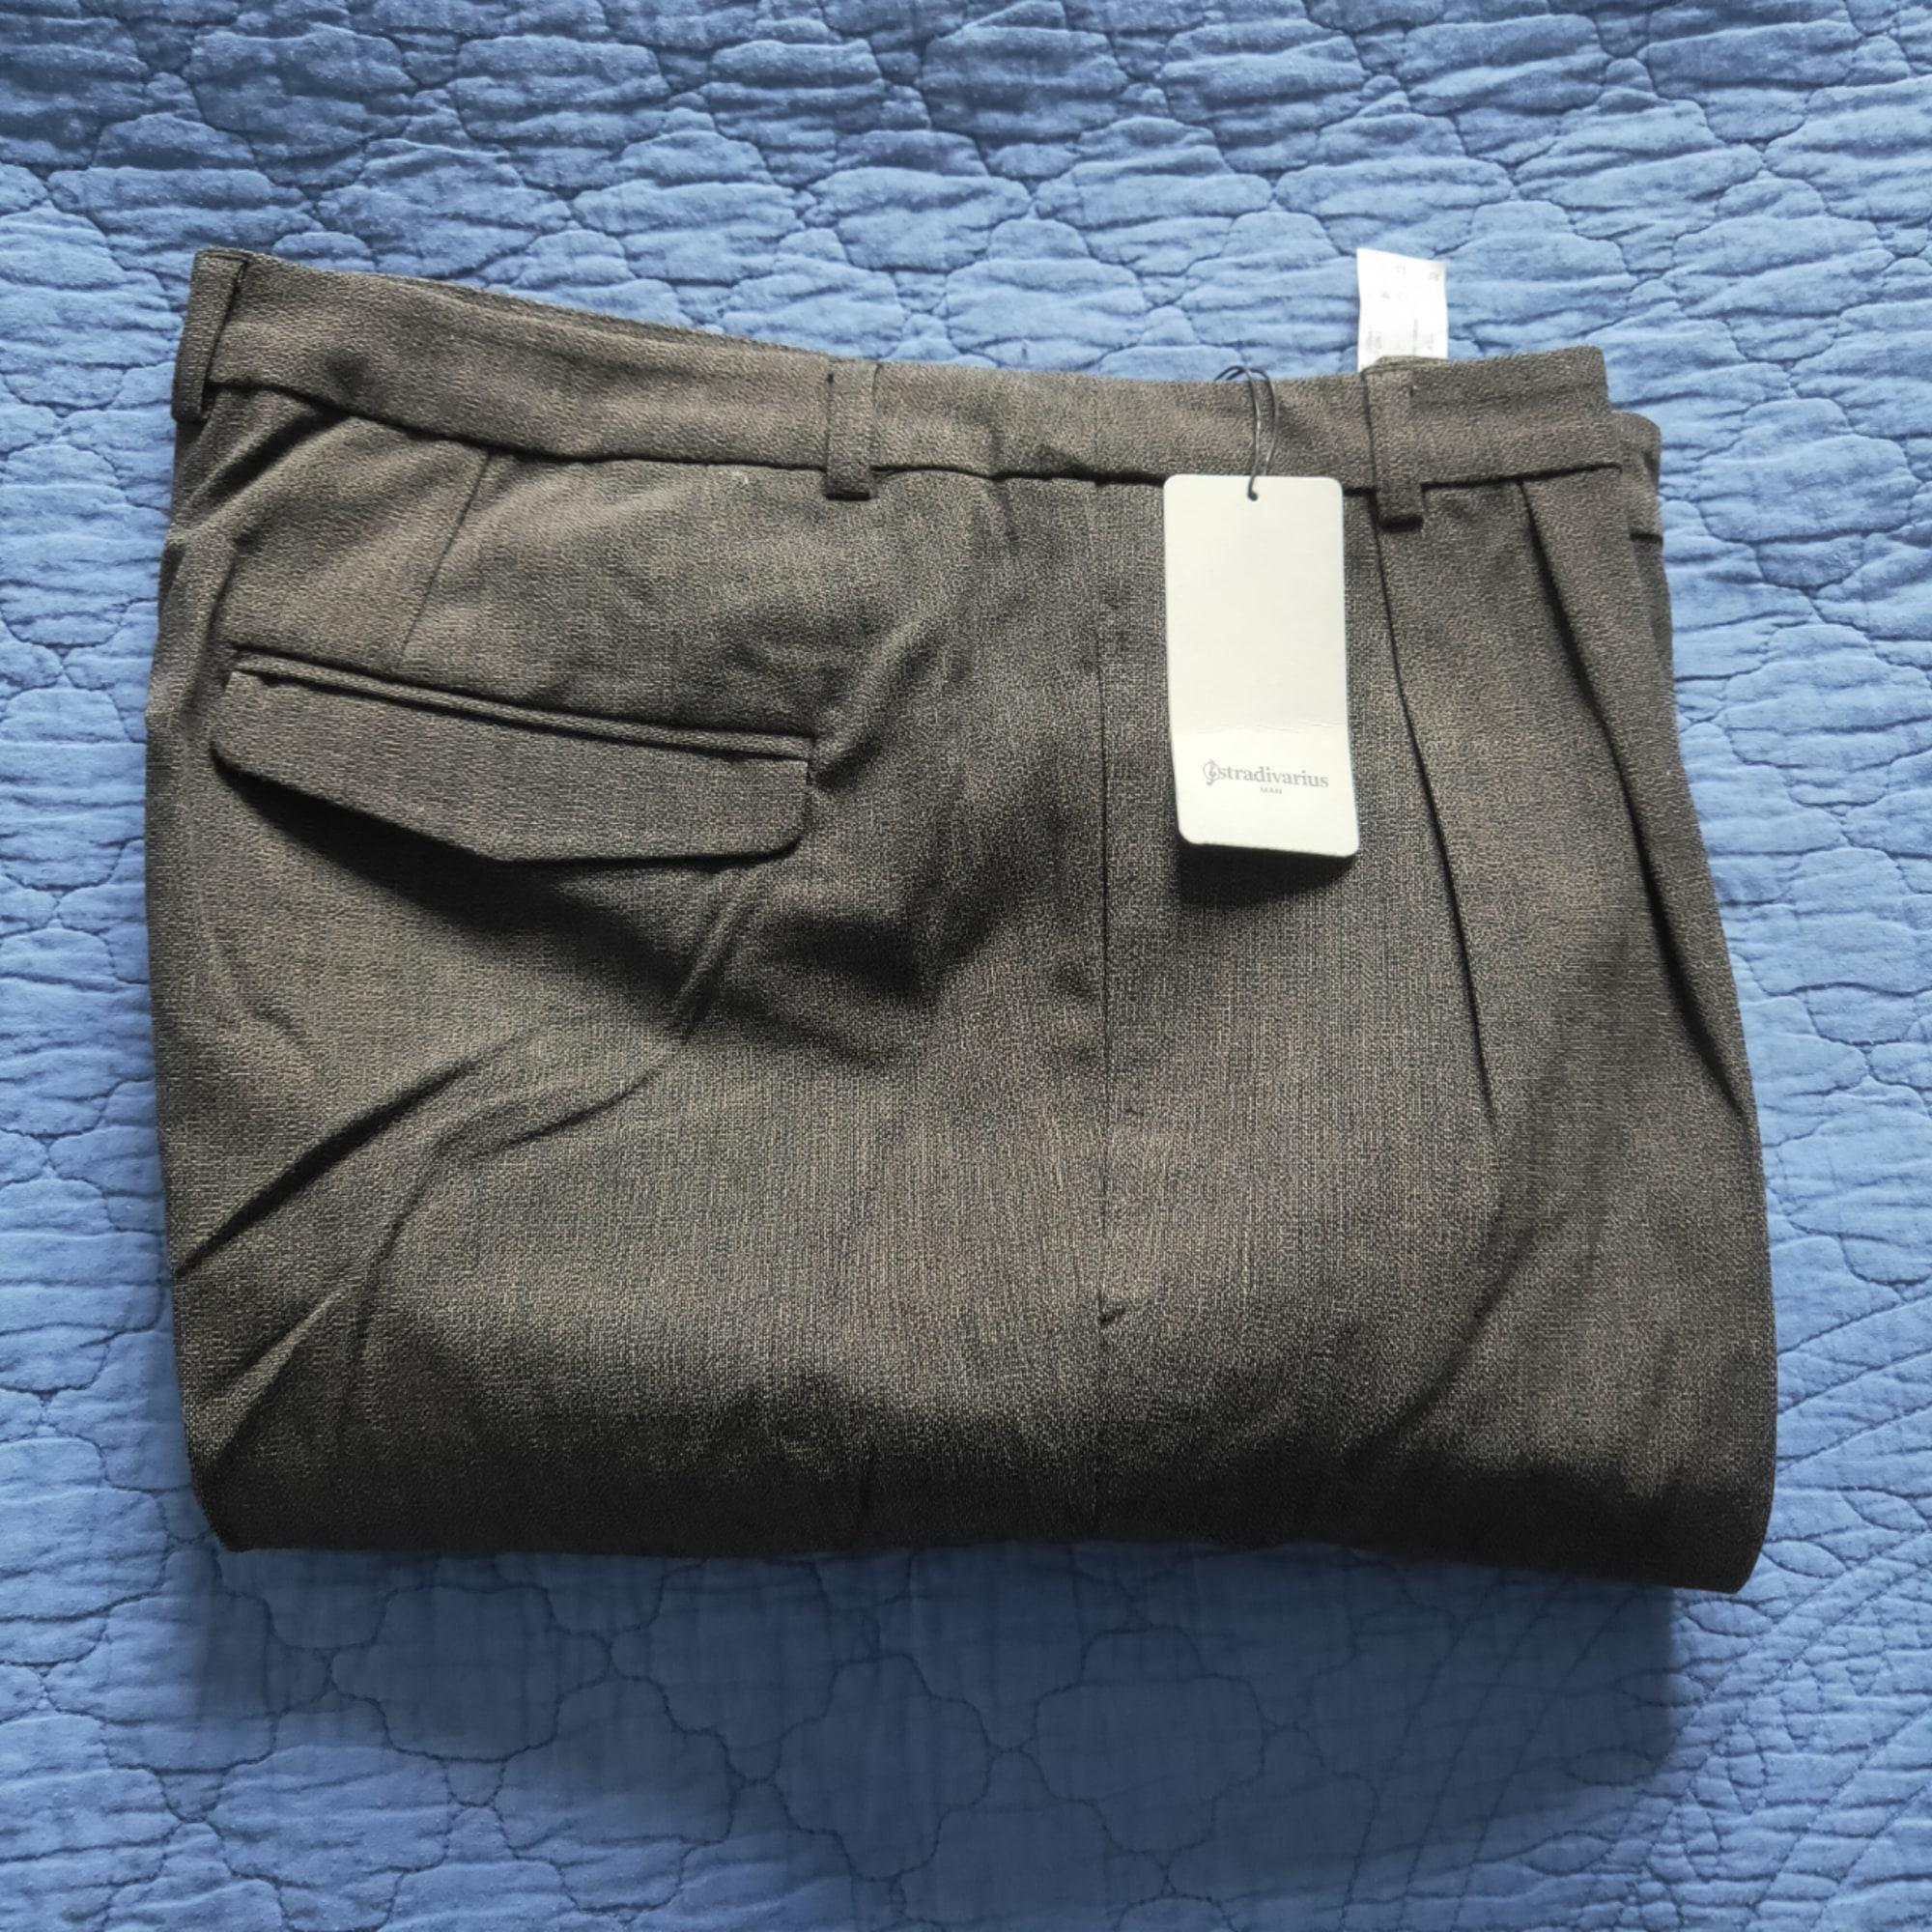 Pantalon droit STRADIVARIUS Marron